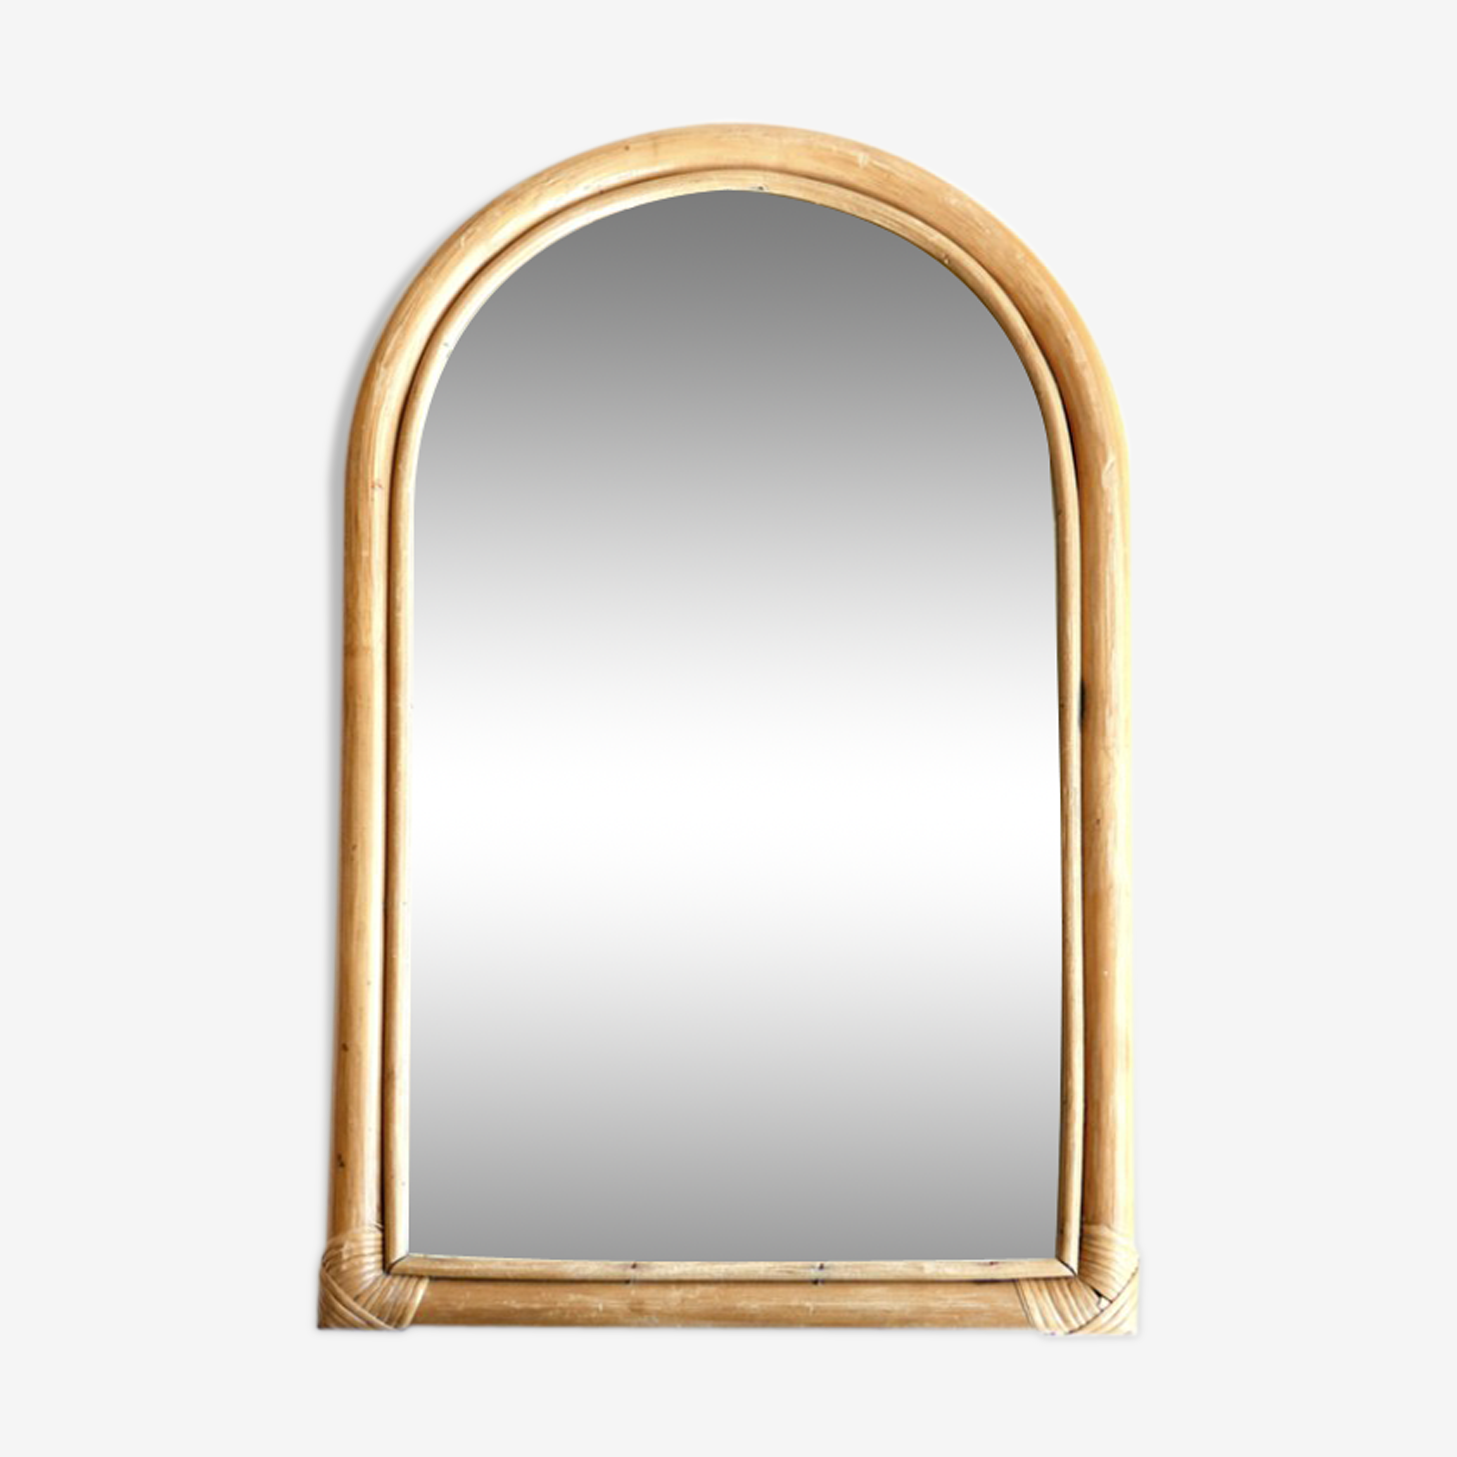 Bamboo mirror, early 1970 - 56x34cm